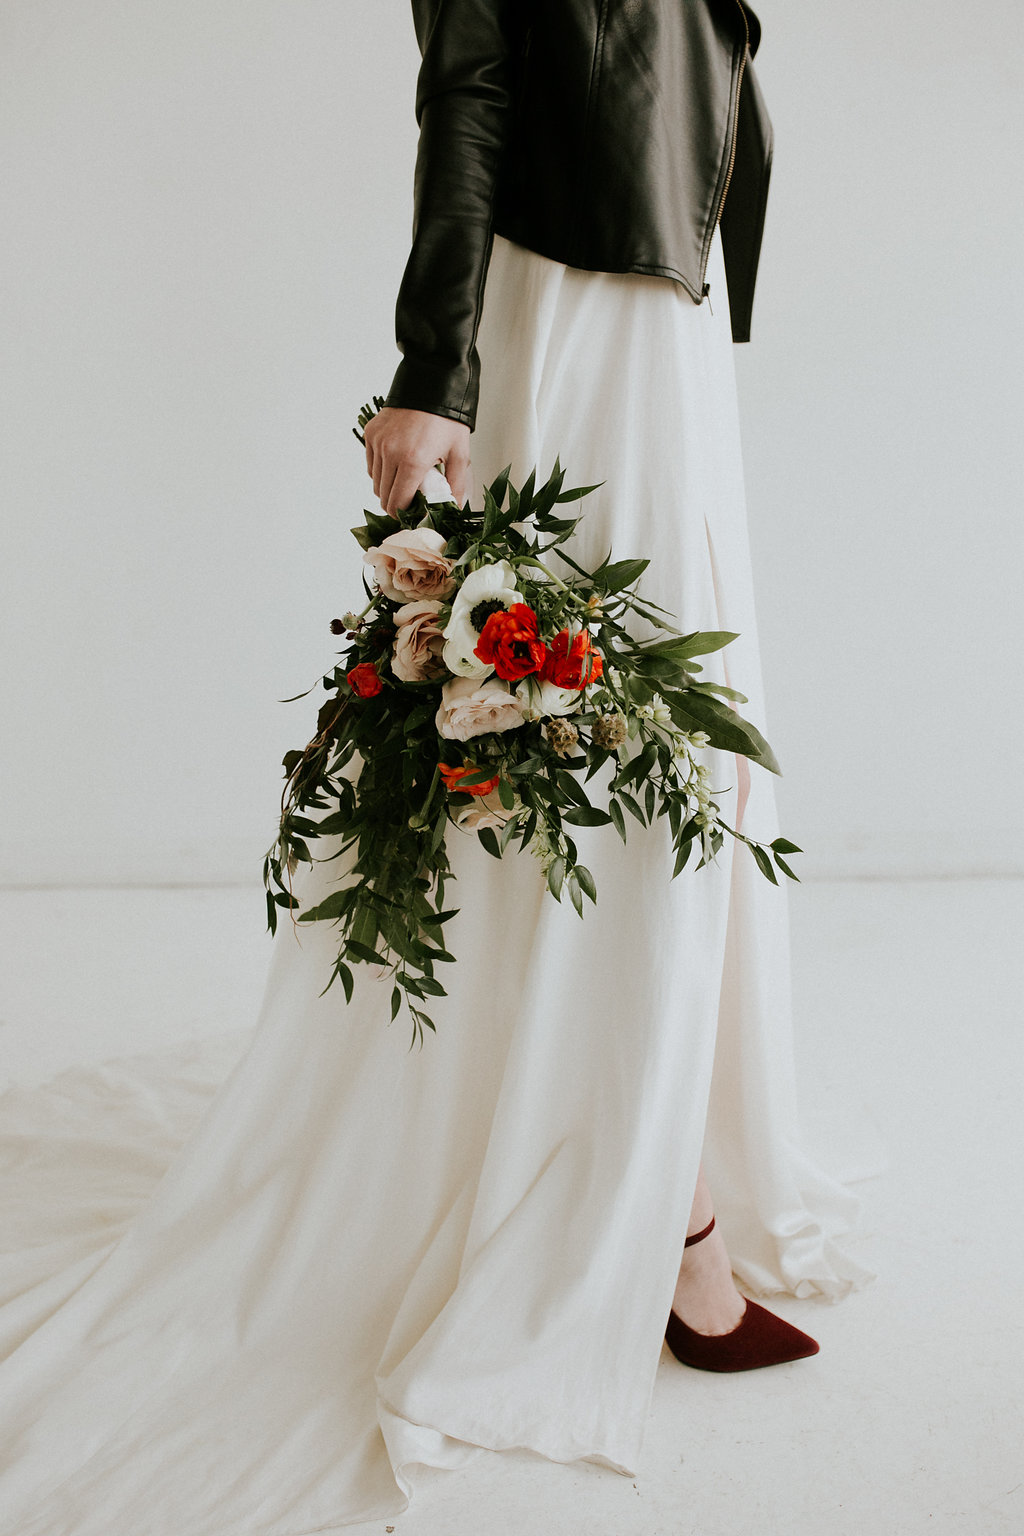 Modern Alternative Bride Bouquet by Studio Terrain